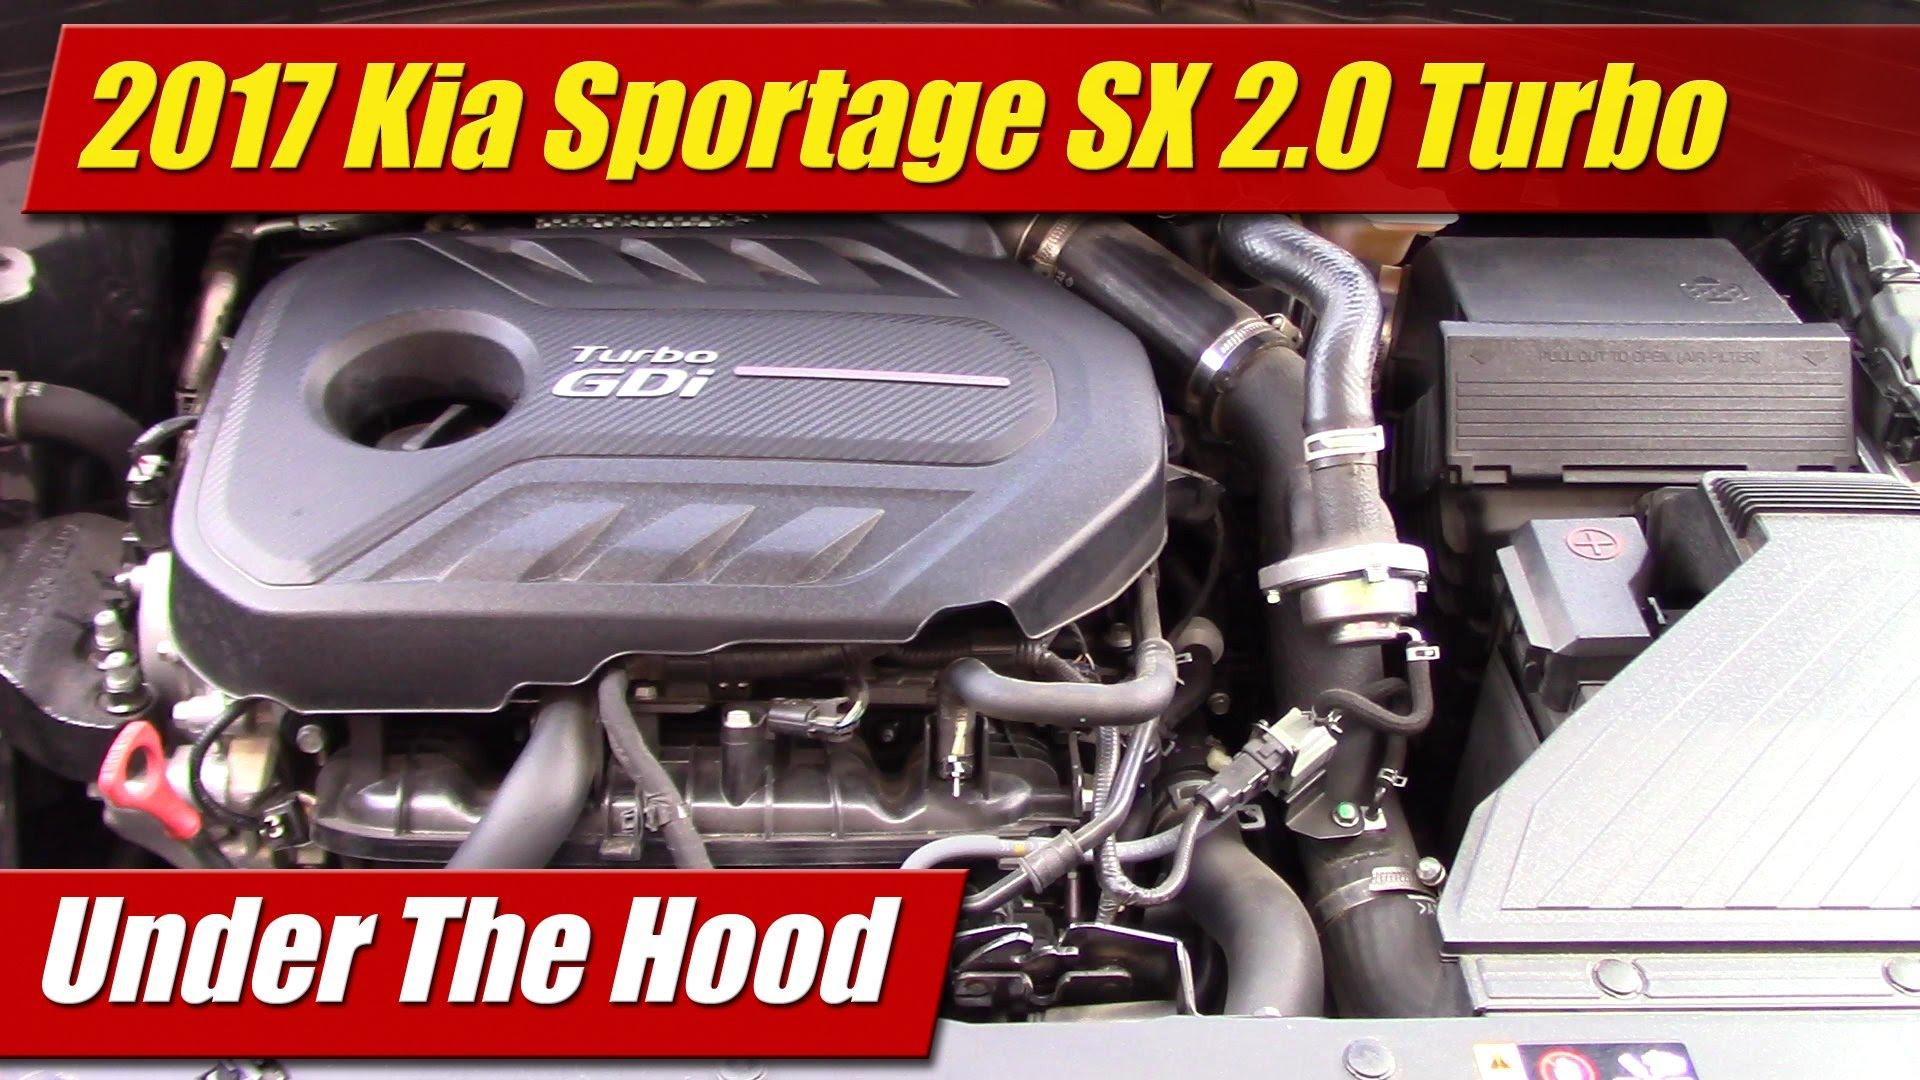 Kia All Wheel Drive >> Under The Hood: 2017 Kia Sportage SX 2.0 Turbo - TestDriven.TV